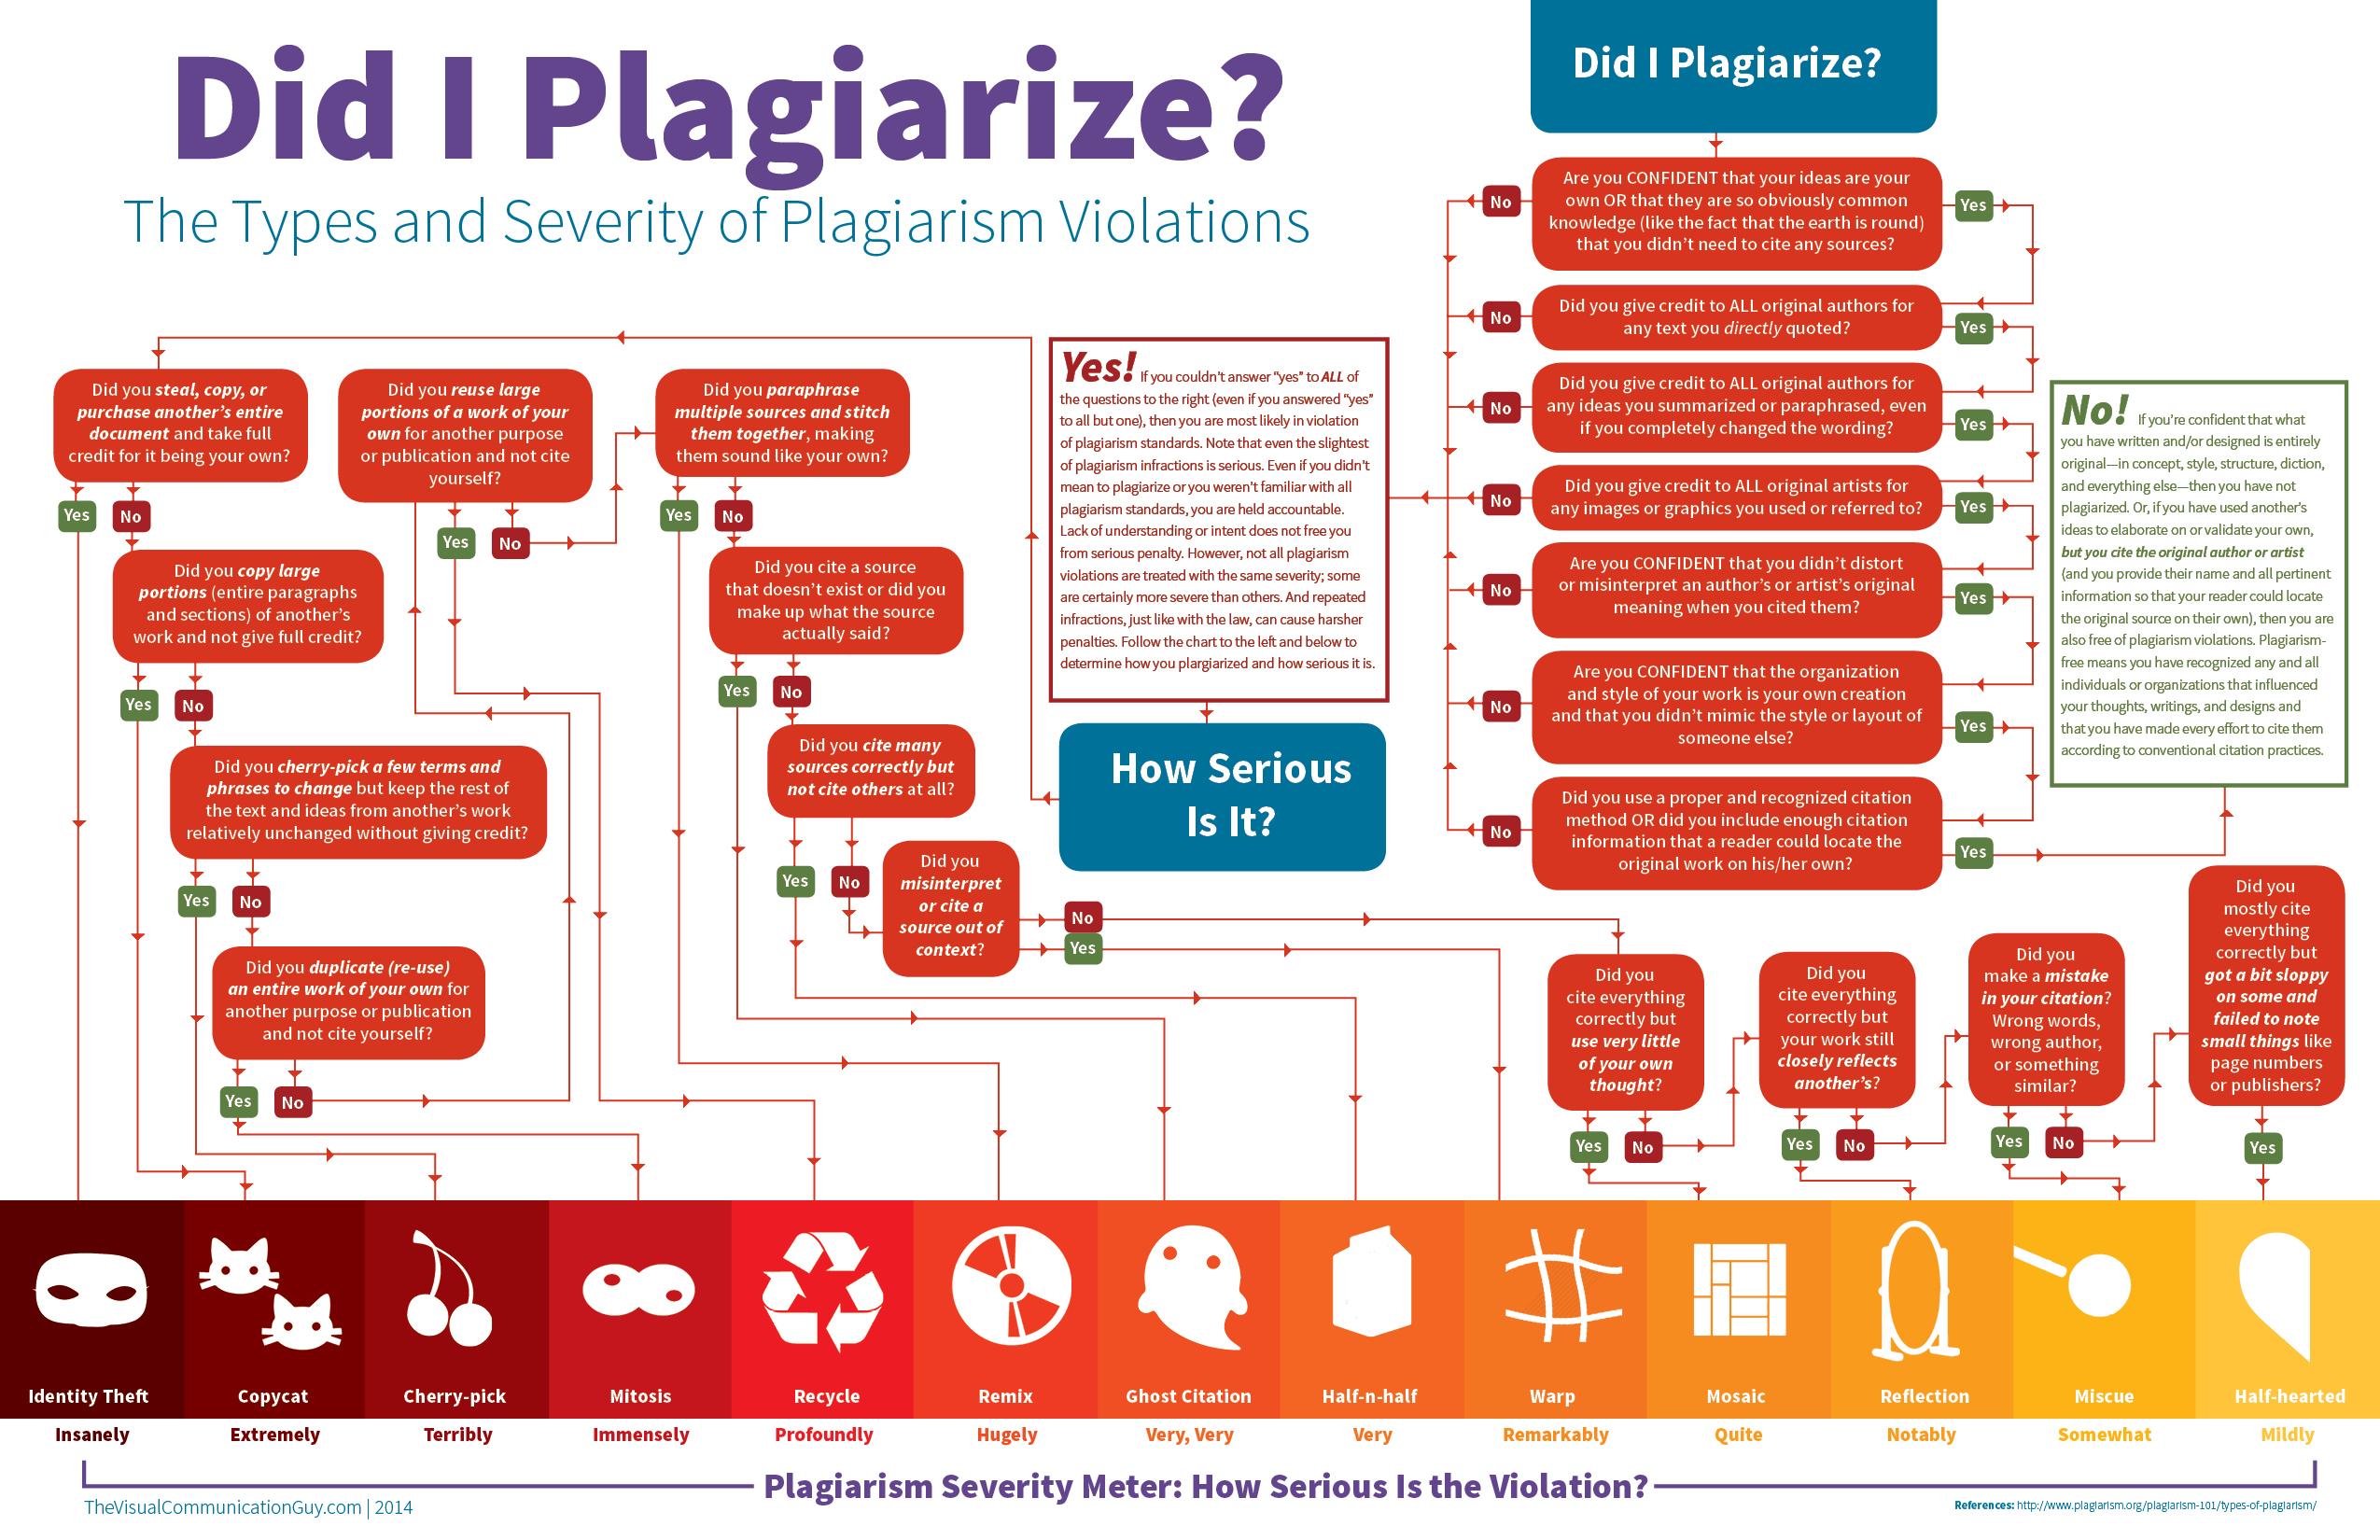 Home Plagiarism Resource Galileo Uga Subject Guide At University Of Georgia Paraphrasing Iu